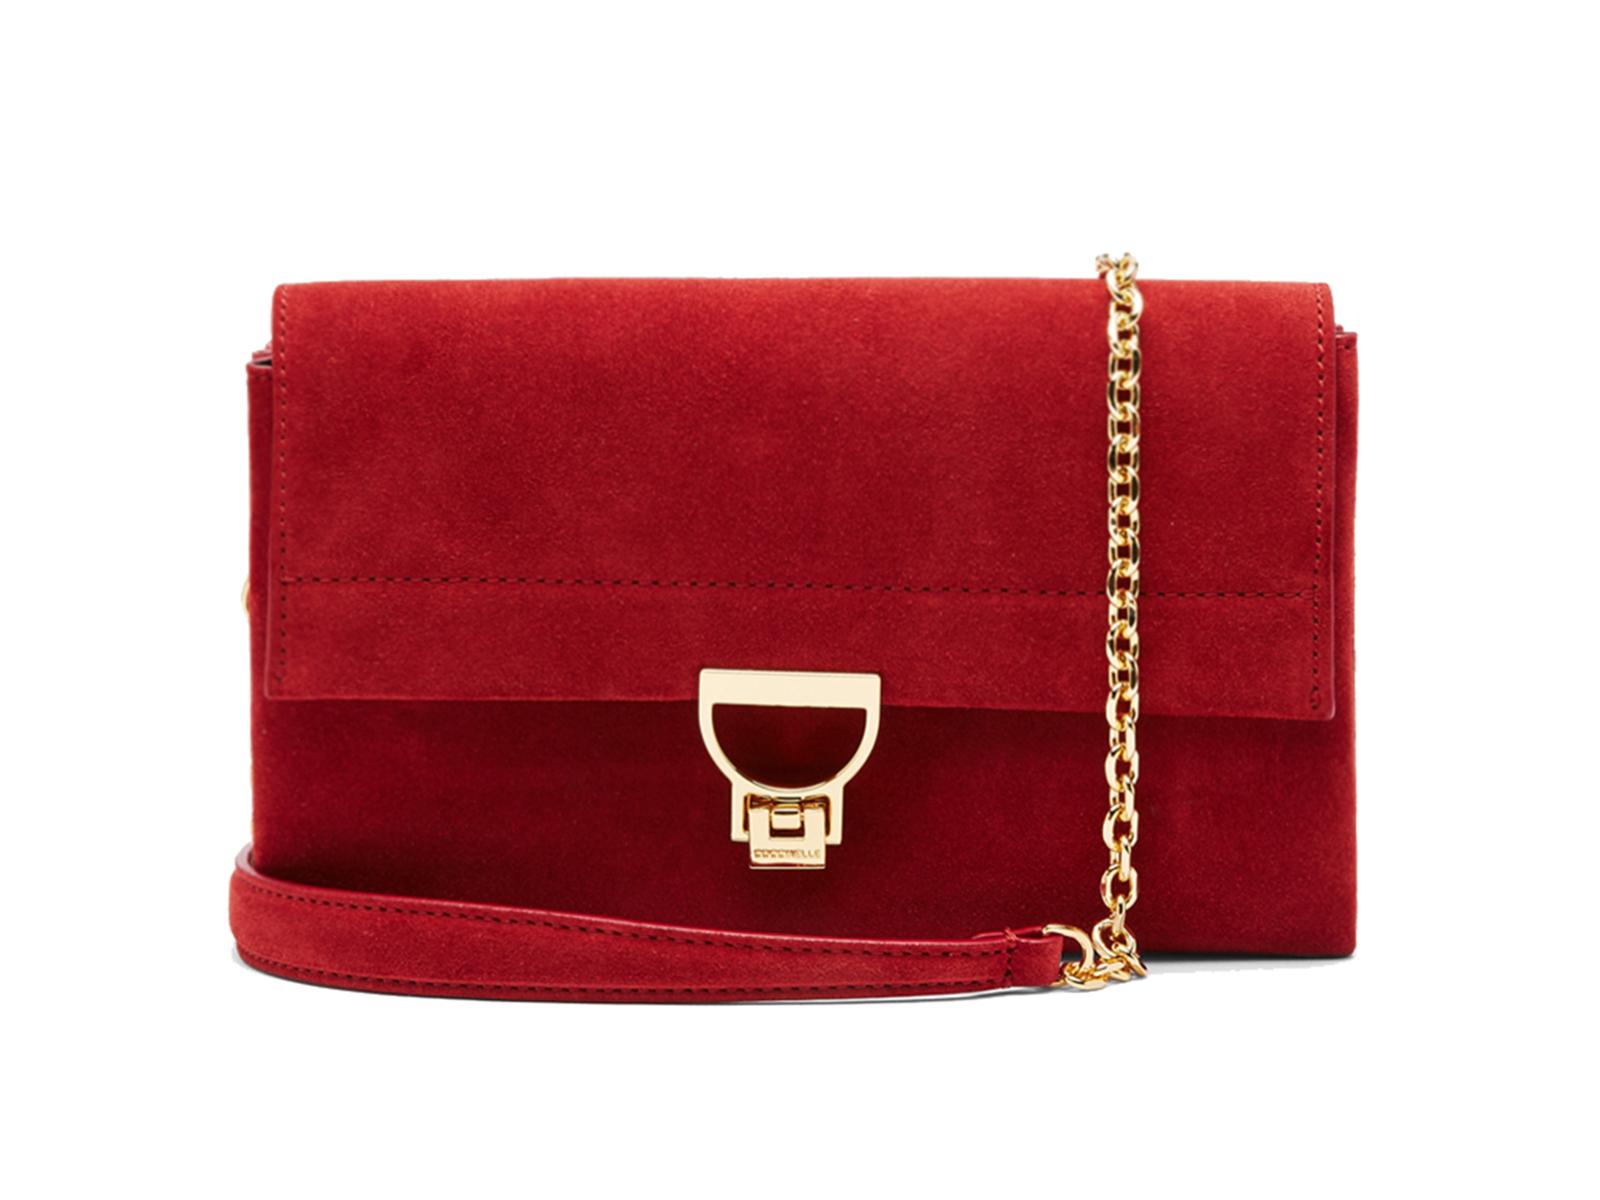 Osvojite predivnu torbicu iz Karle povodom Dana žena!